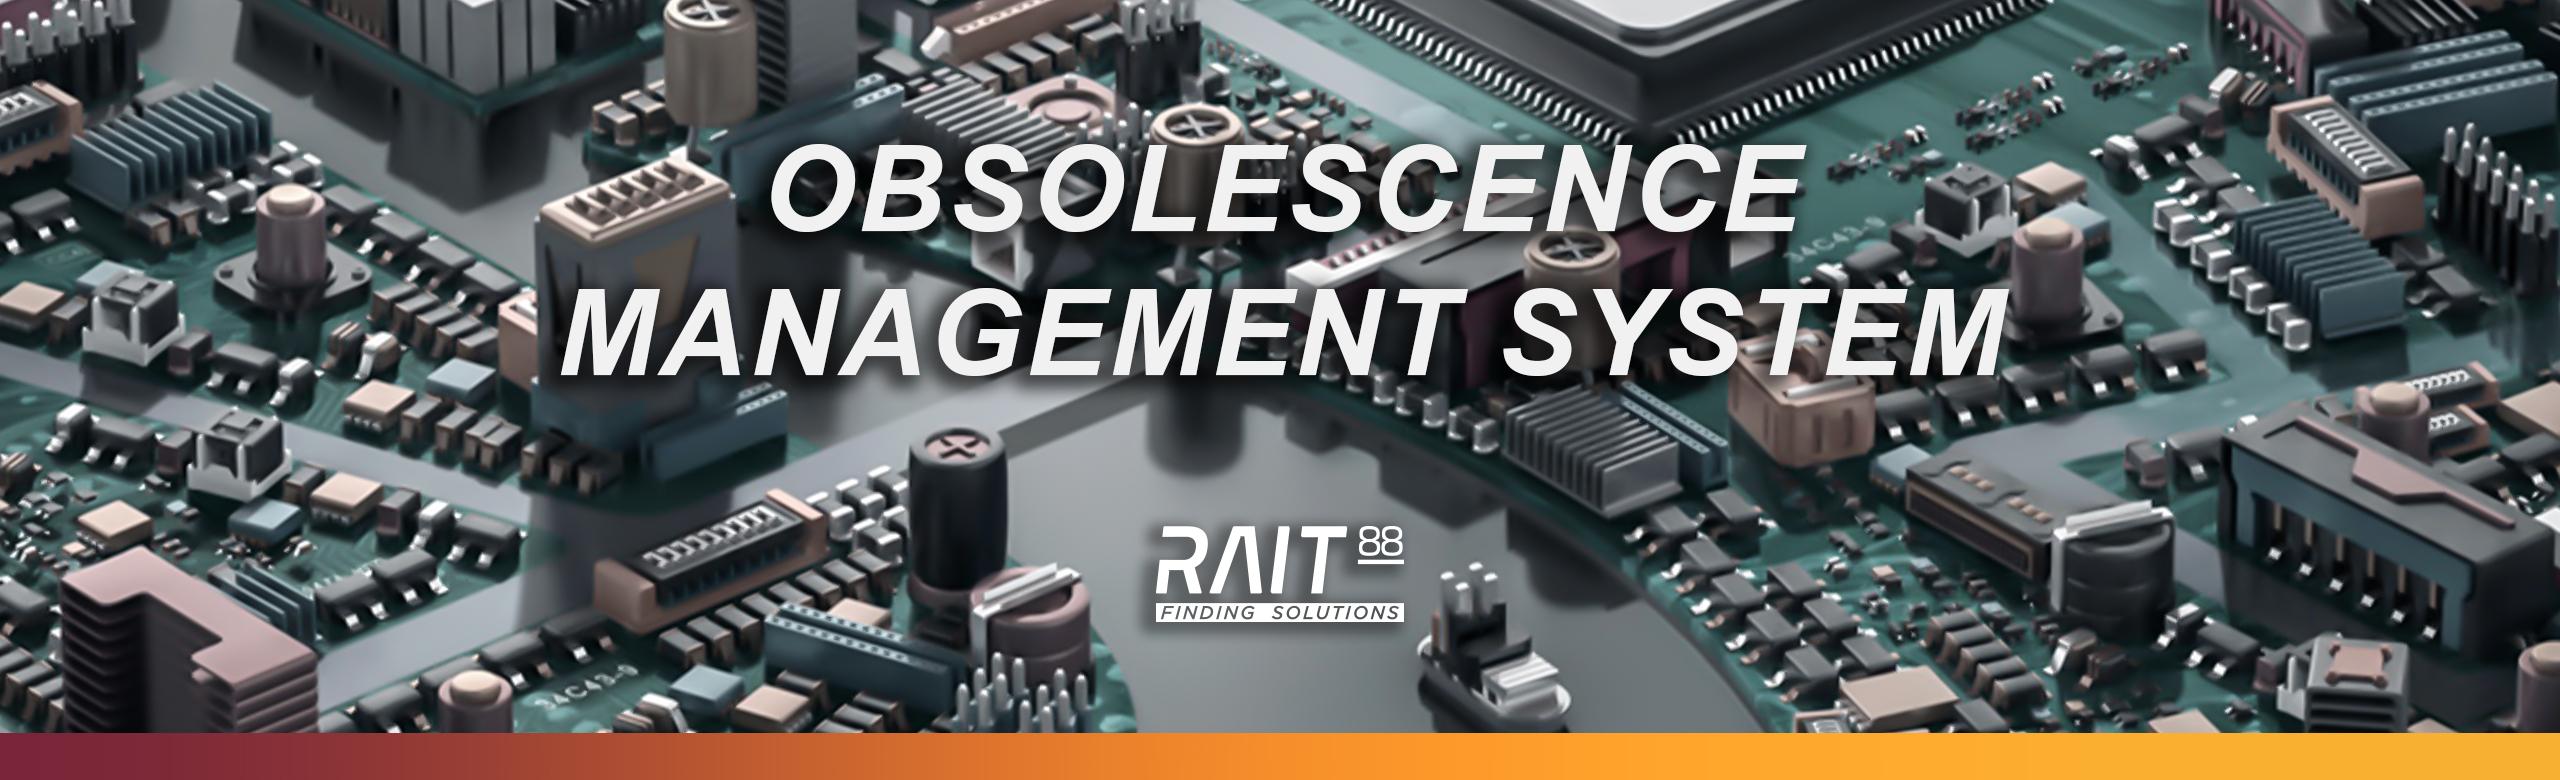 Obsolescence management system